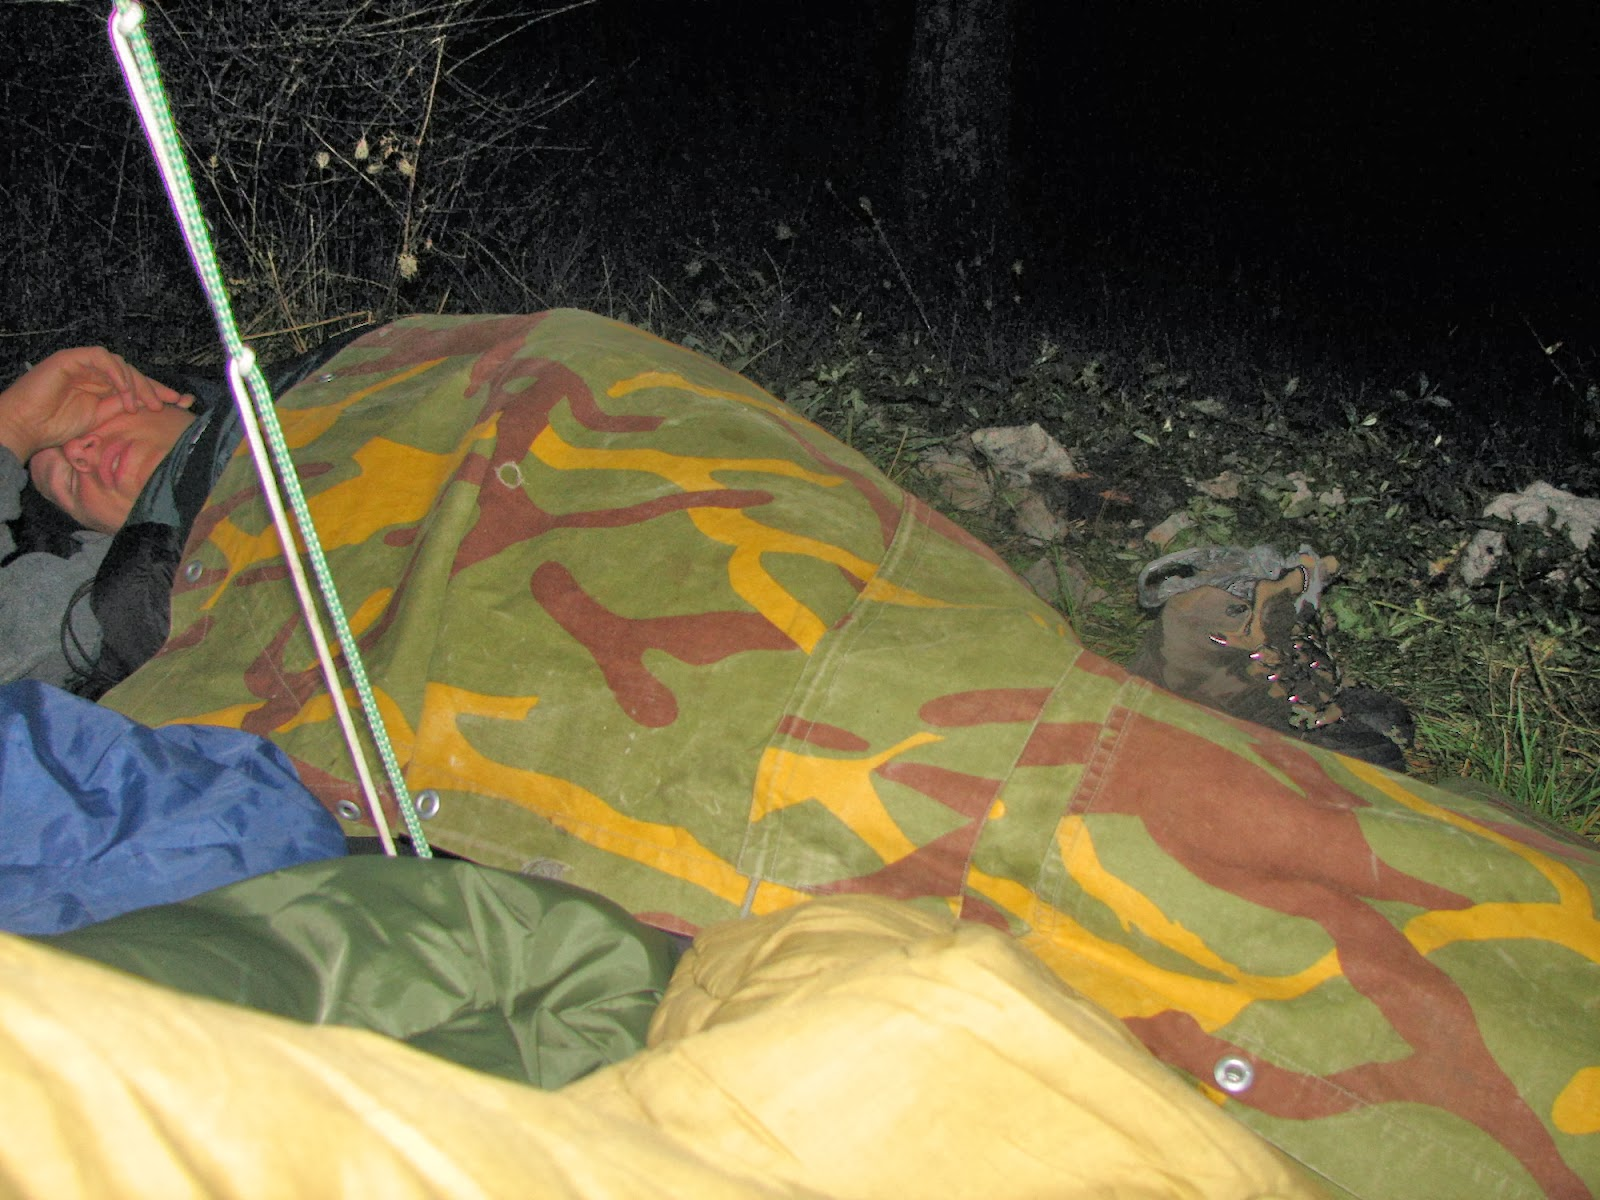 Prehod PP, Ilirska Bistrica 2005 - picture%2B098.jpg